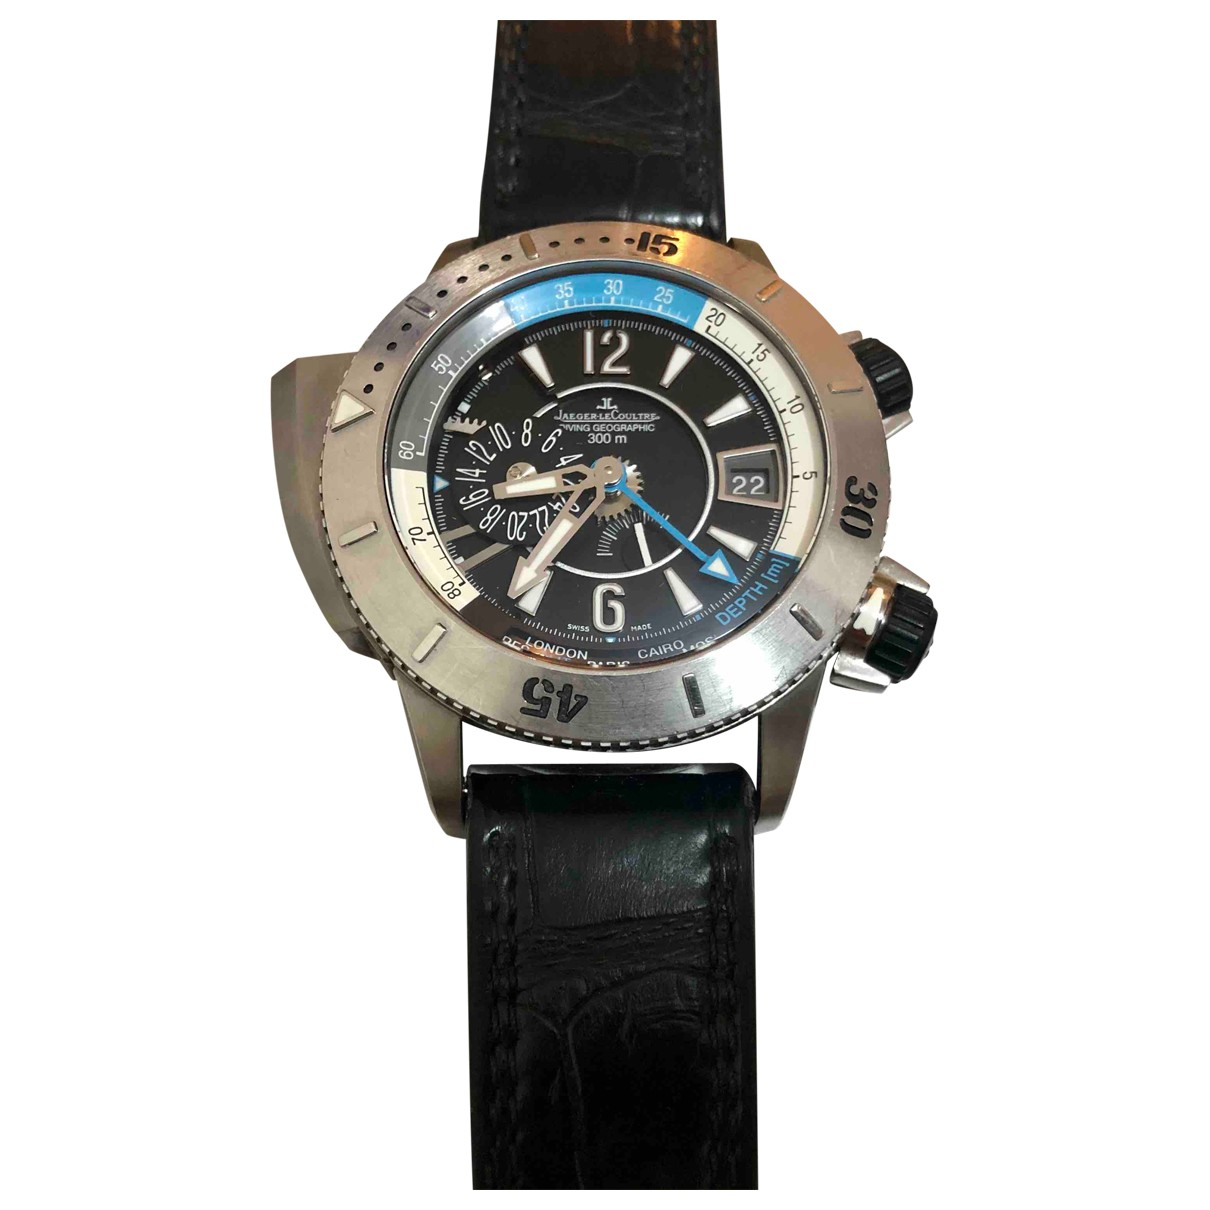 Jaeger-lecoultre Master Compressor  Uhr in Titan